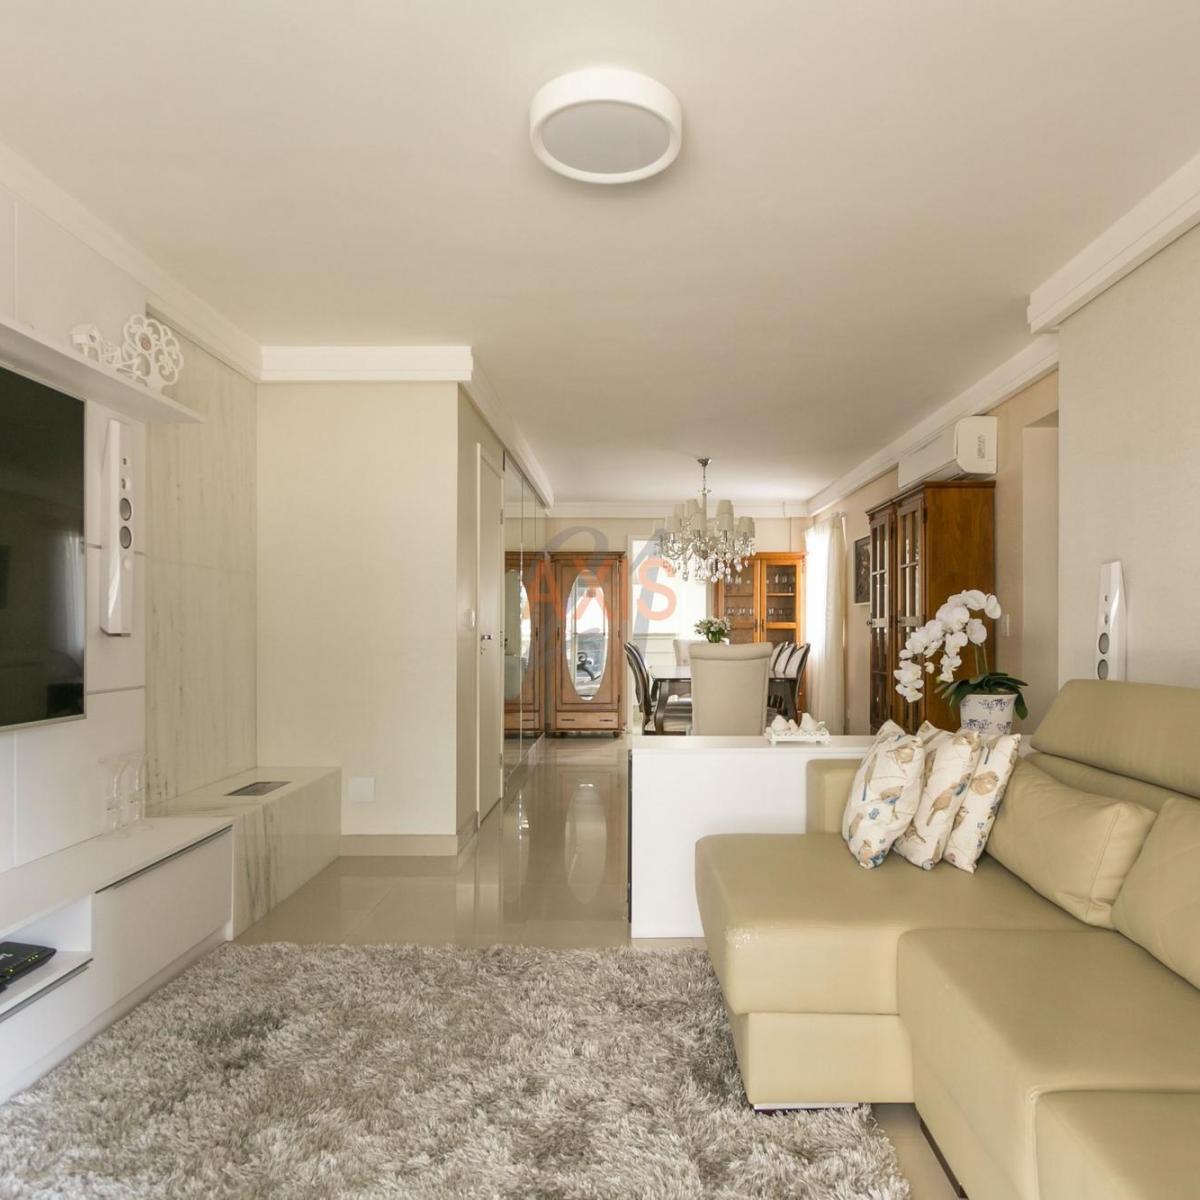 http://www.infocenterhost2.com.br/crm/fotosimovel/283073/82620524-apartamento-curitiba-cabral_marcadagua.jpg